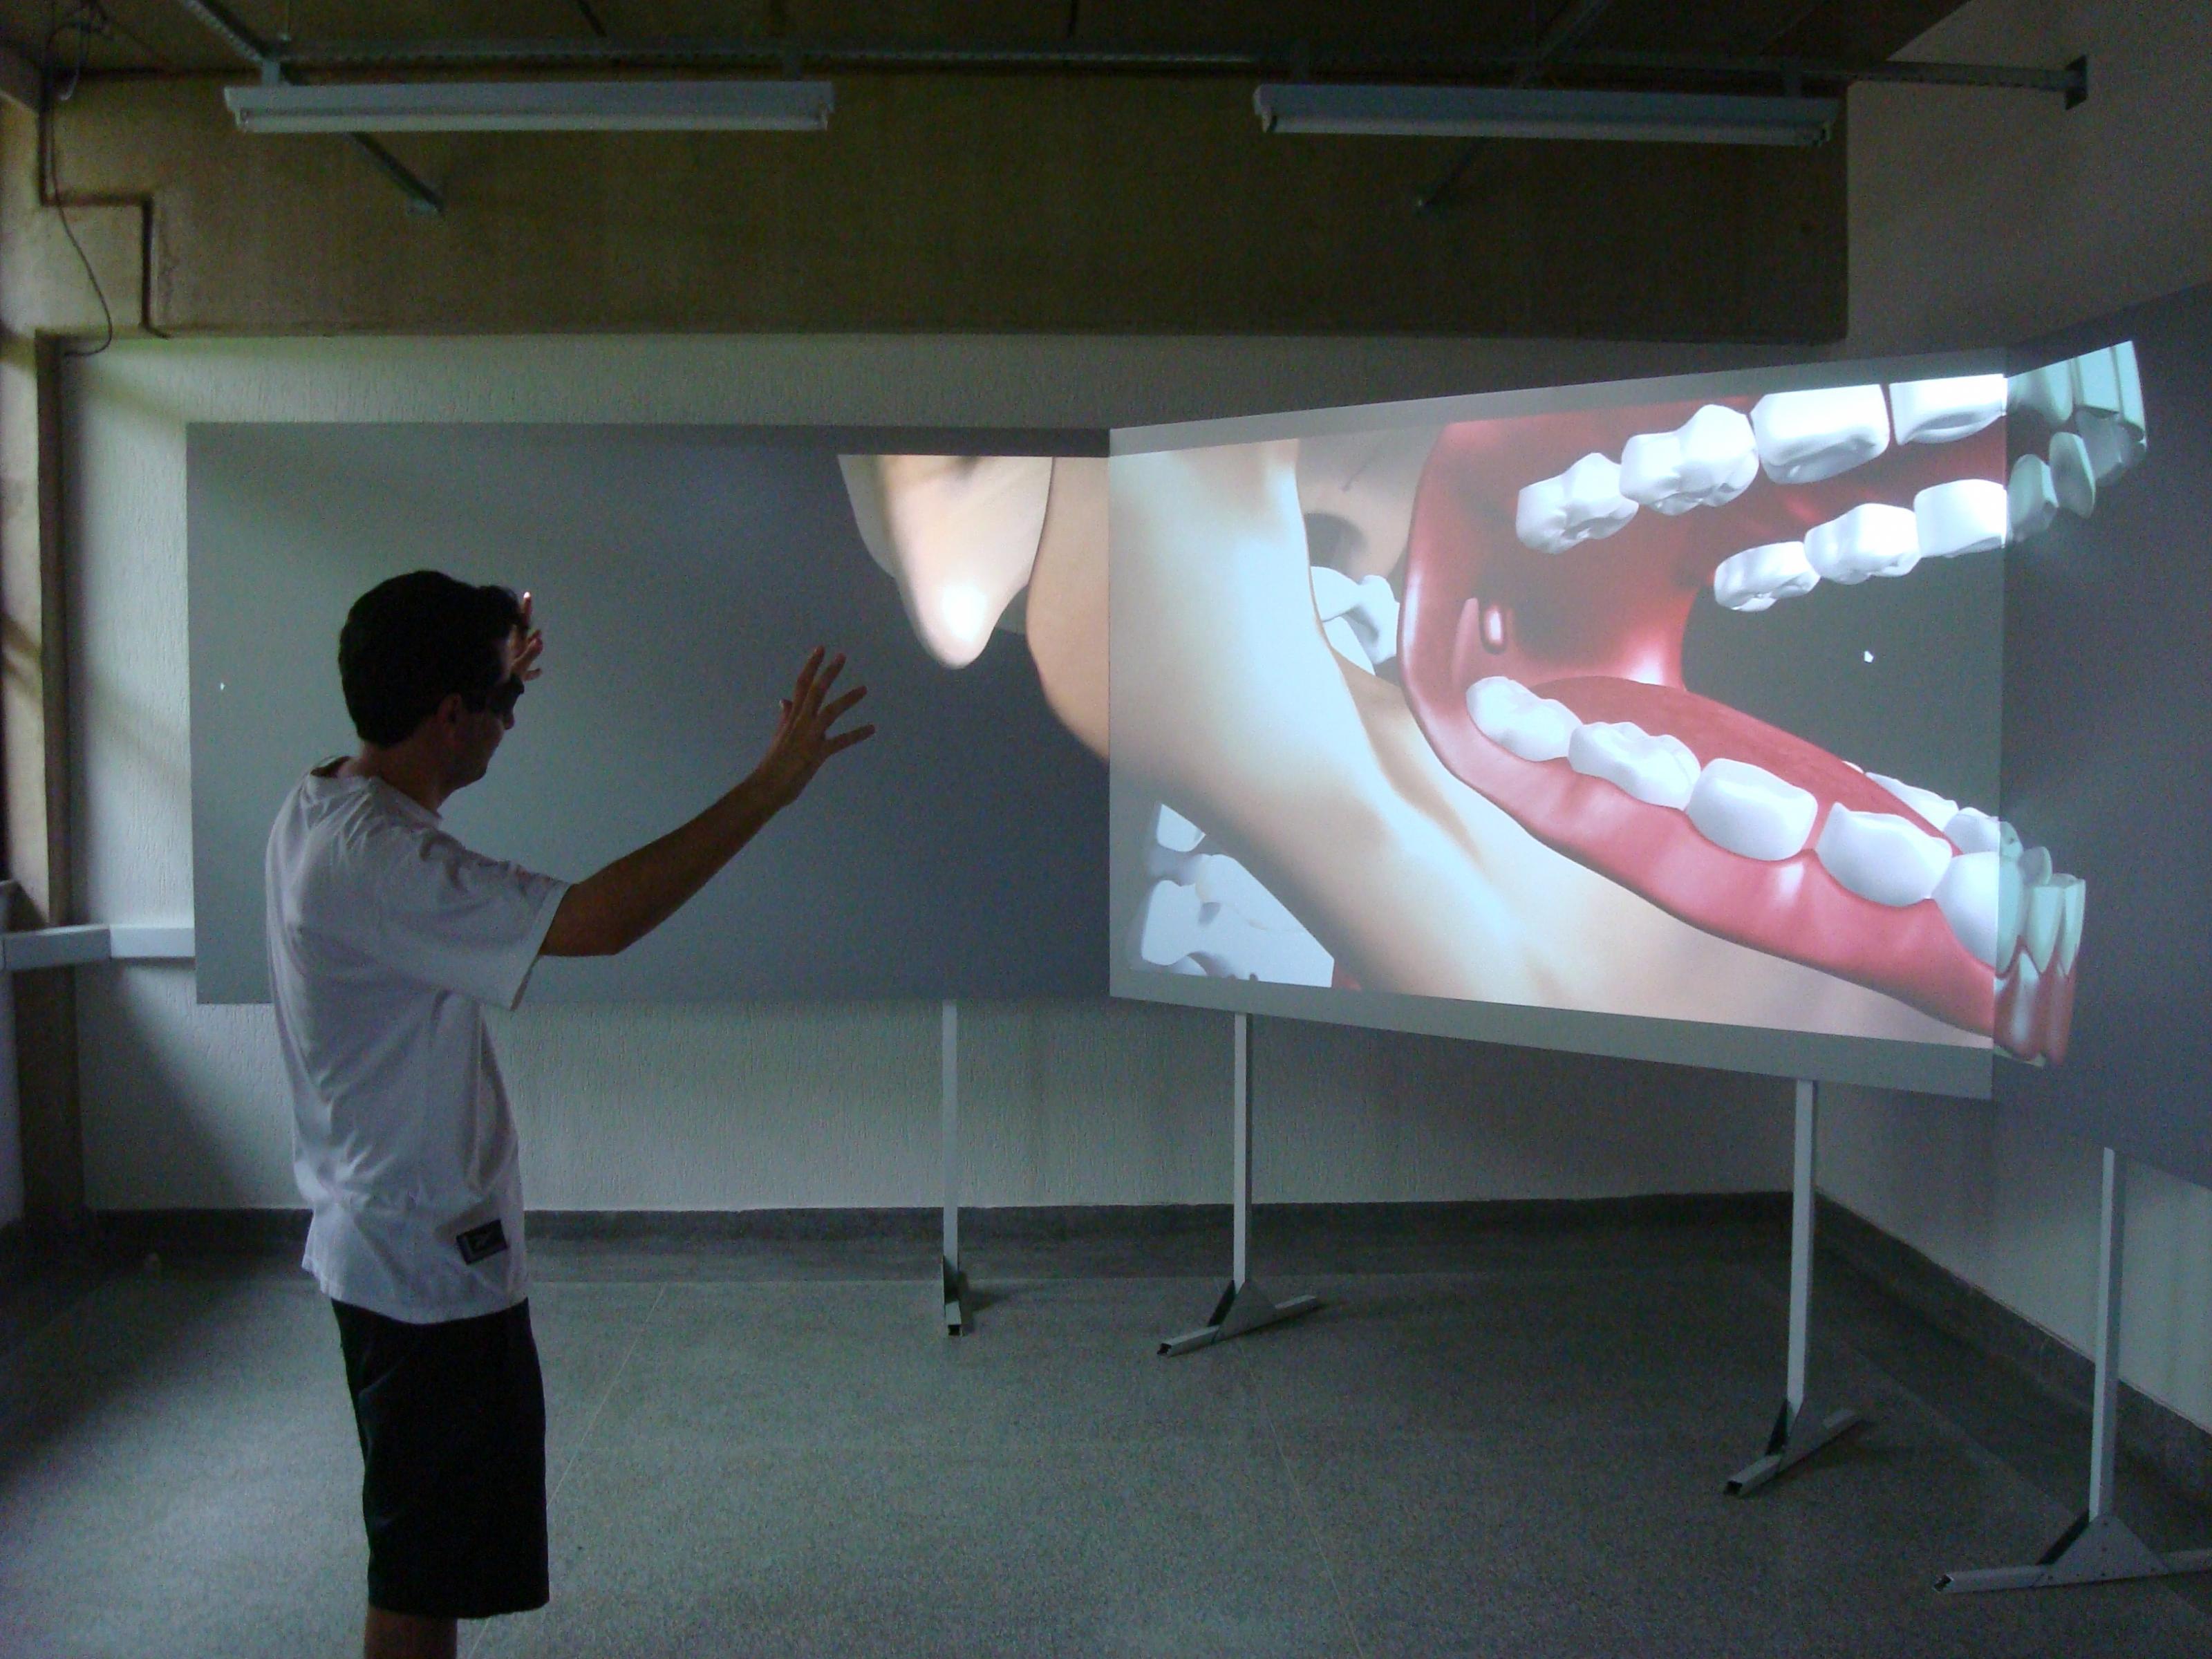 3D Immersive Environments image